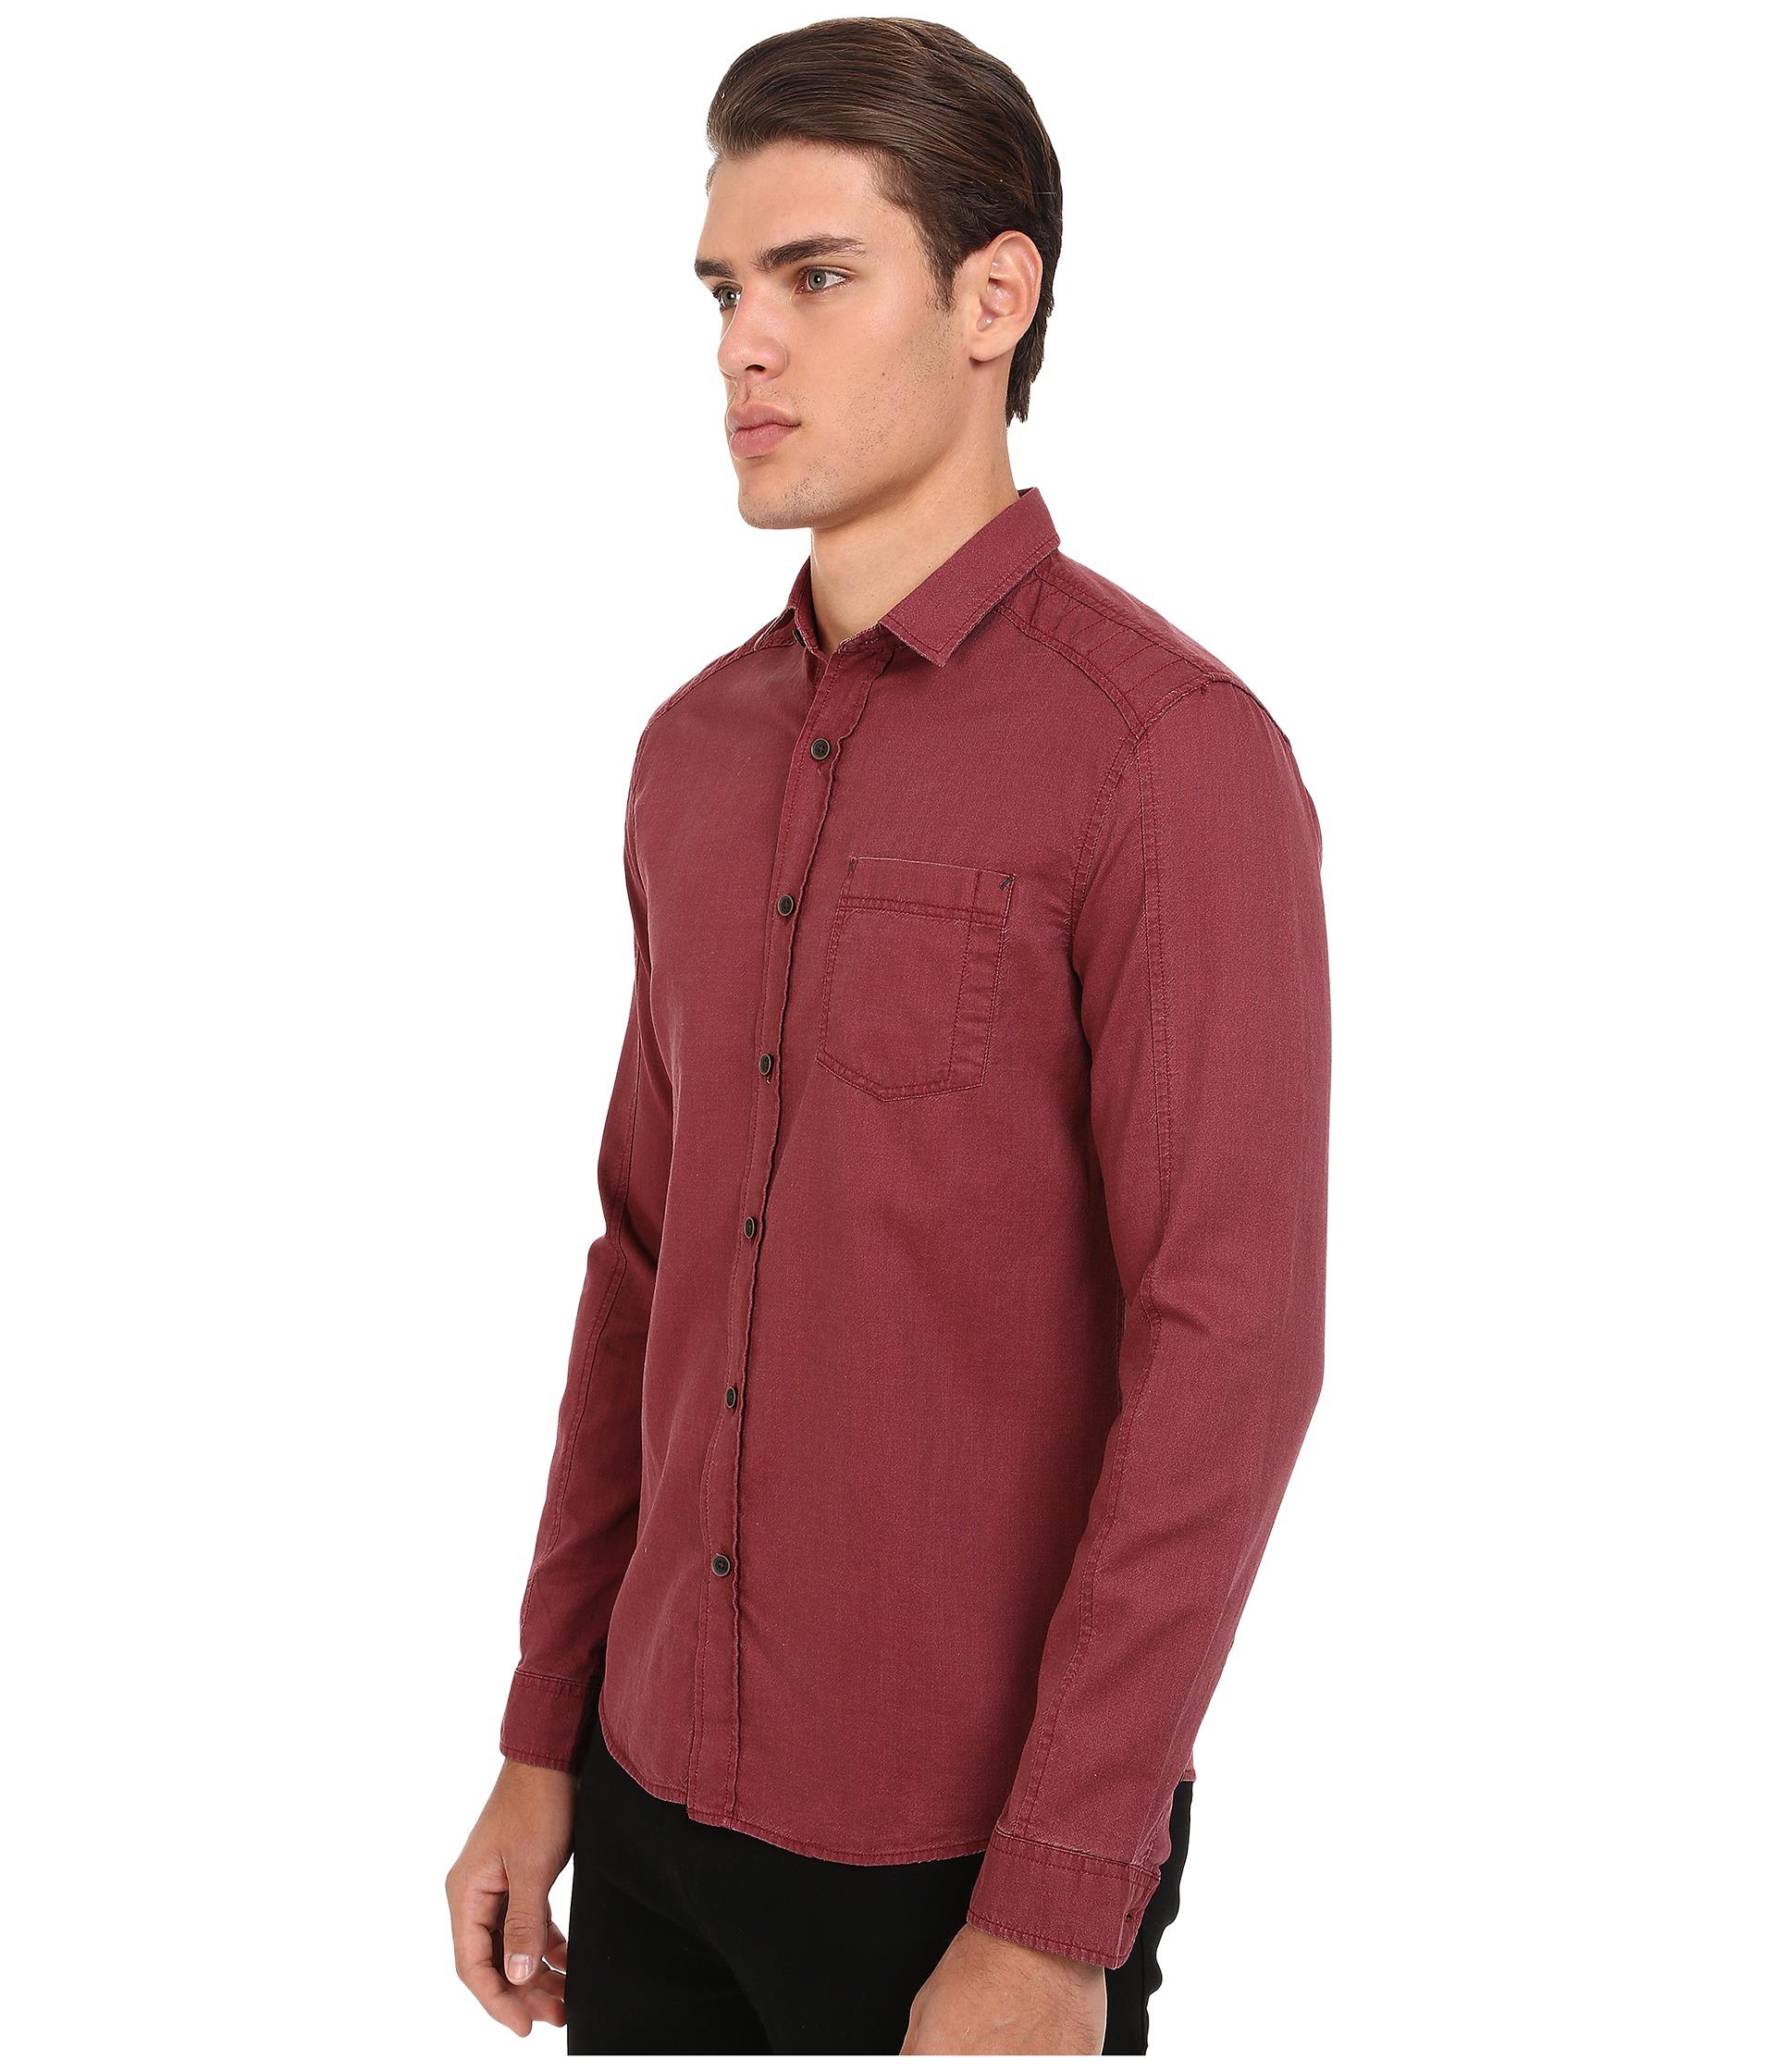 Jeans button down shirt greek t shirts for Denim button down shirts